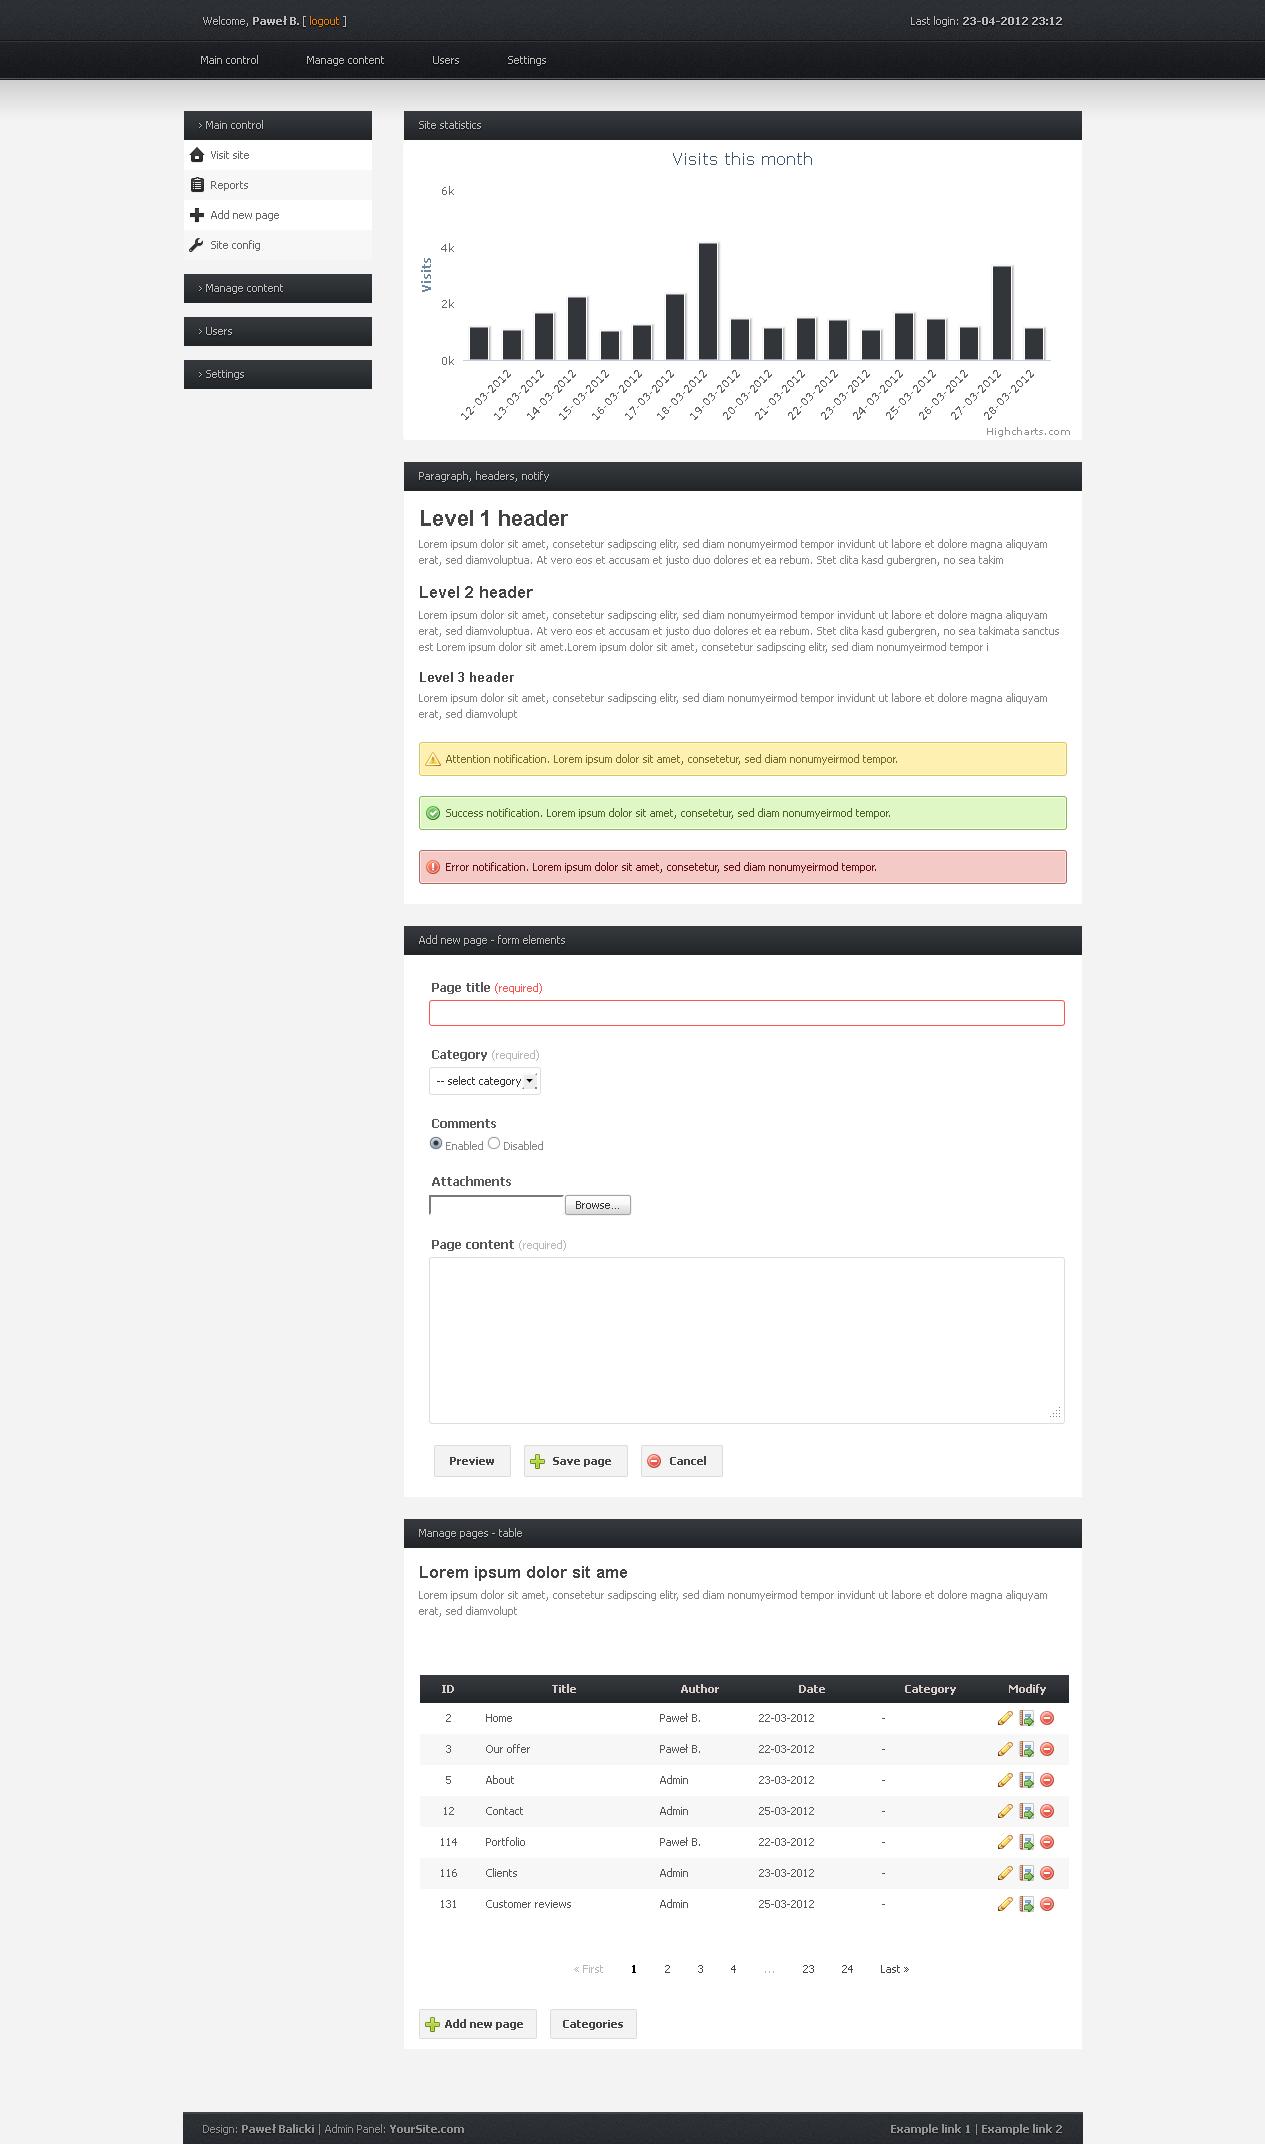 simpleadmin free admin panel template by kilab on deviantart. Black Bedroom Furniture Sets. Home Design Ideas